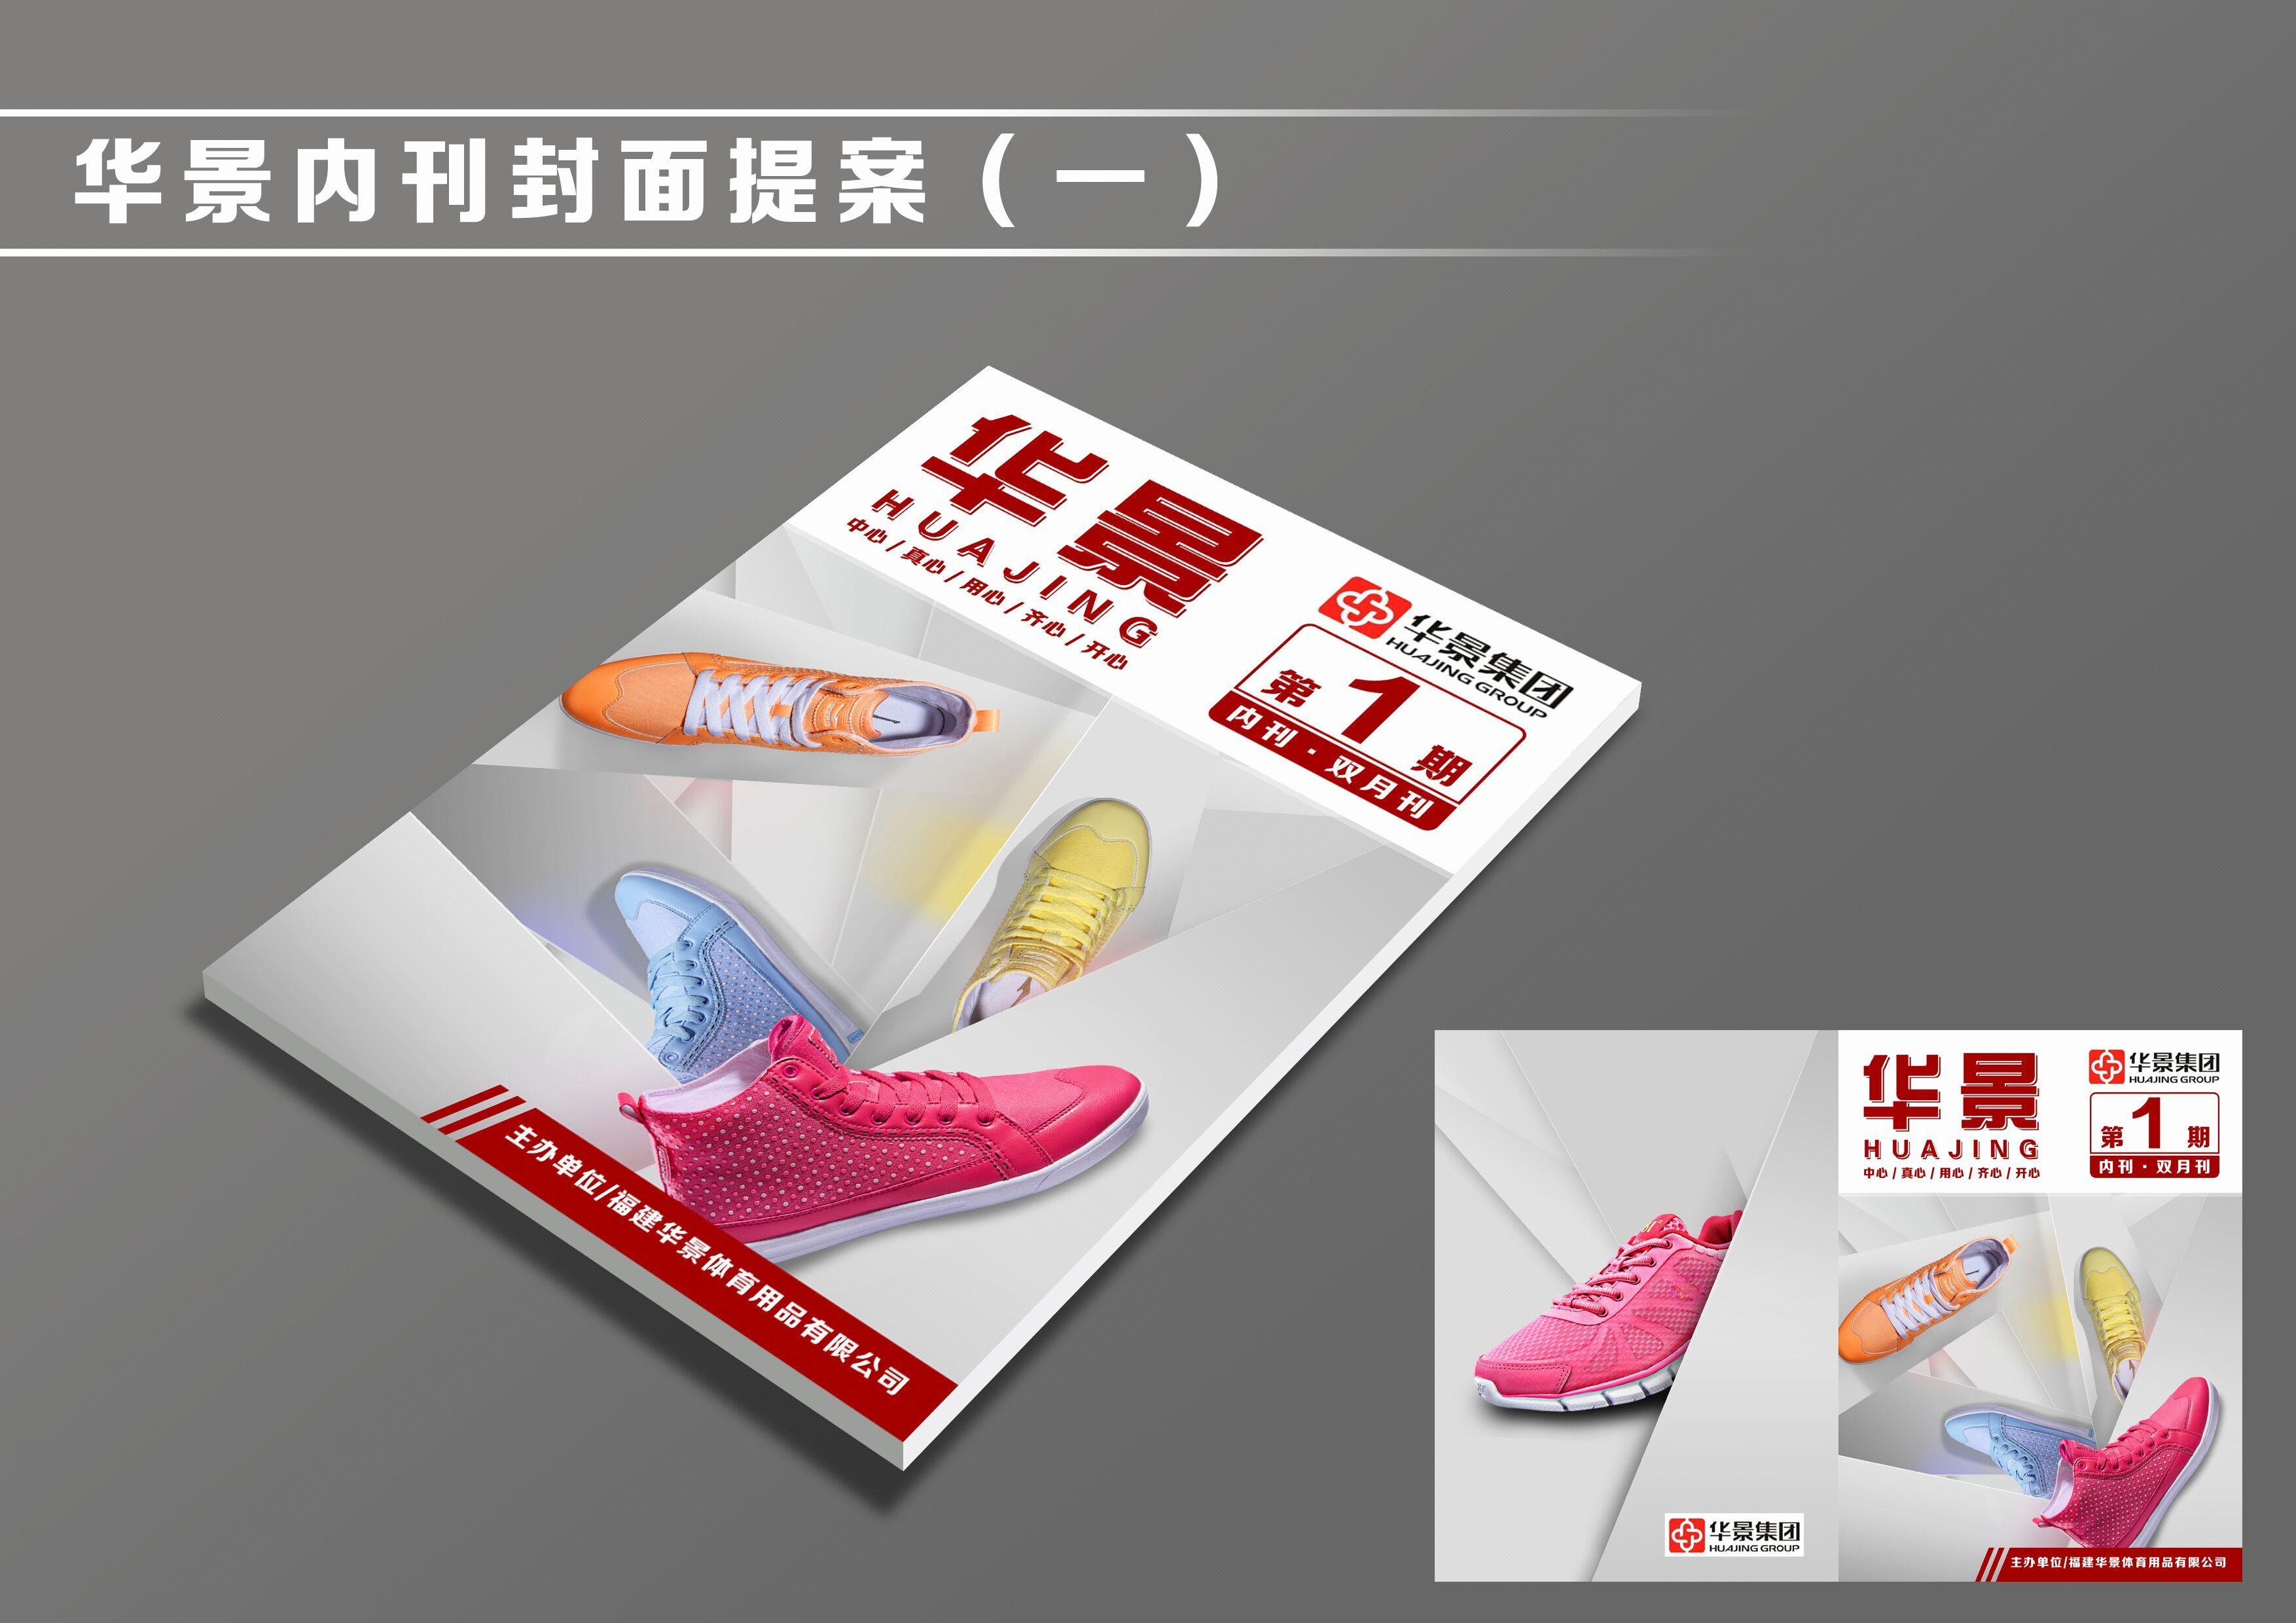 PPT修图WORD排版PS插画图片处理PS修图广告宣传品设计